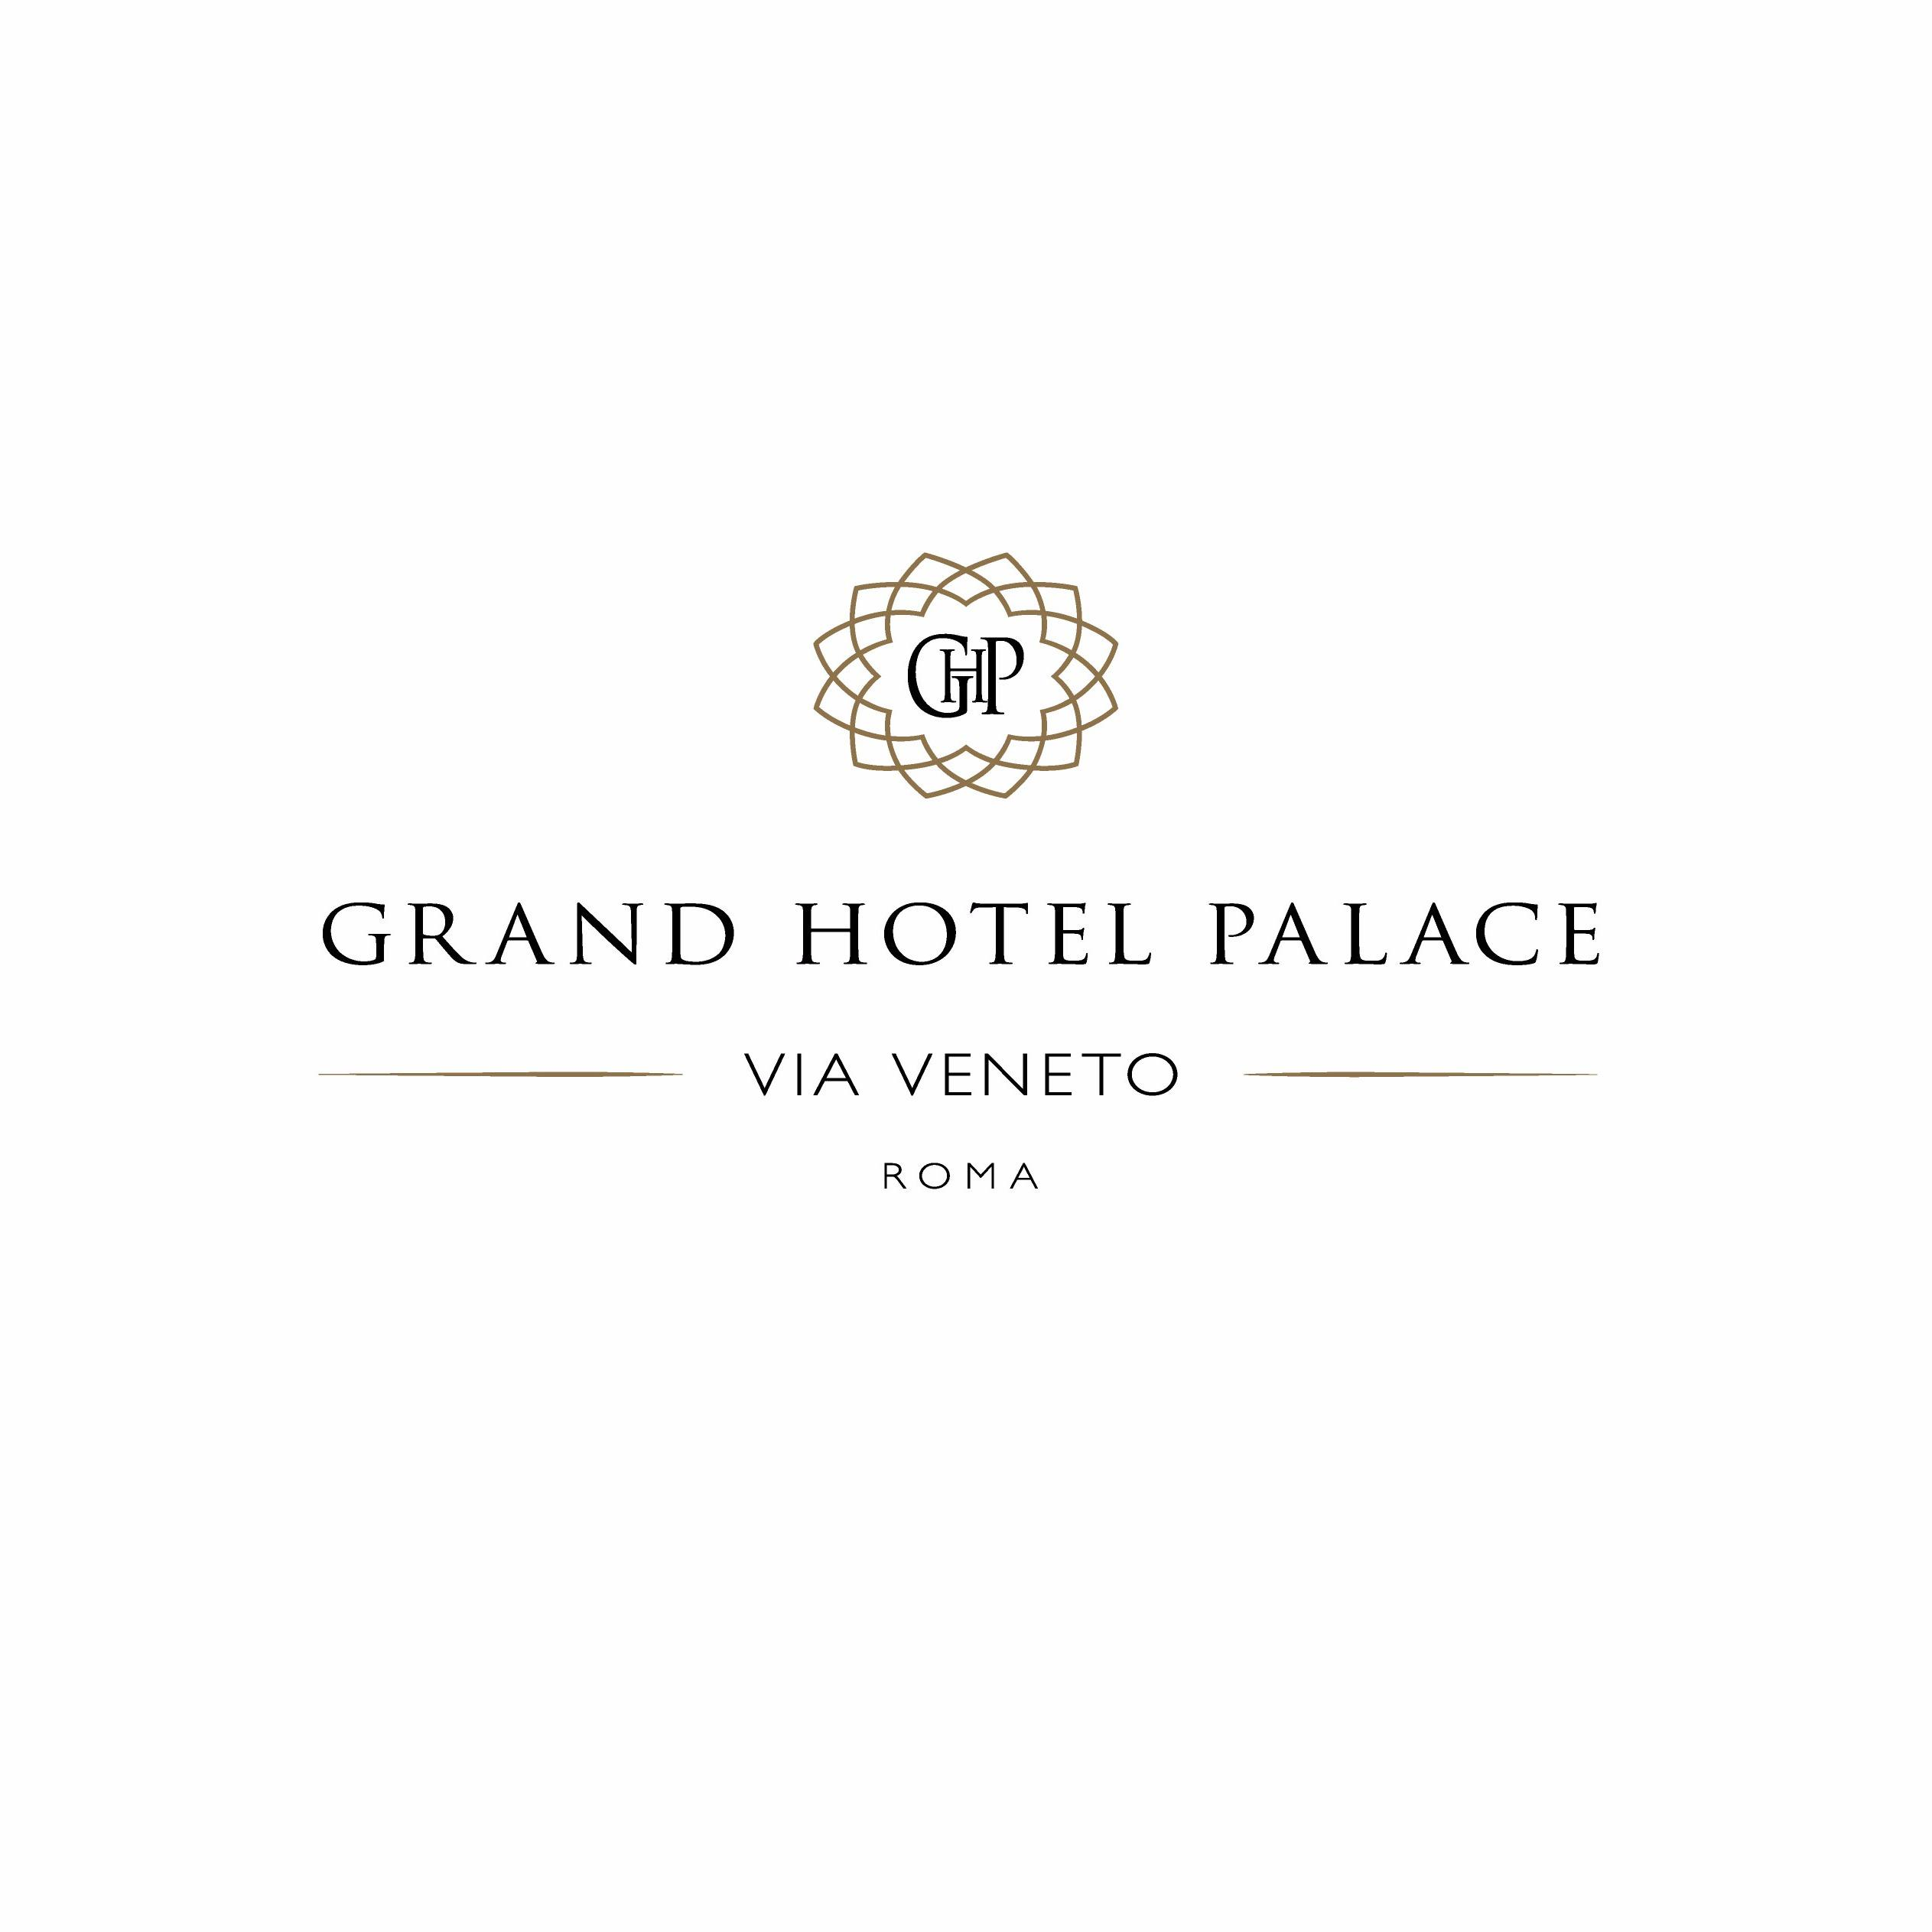 Grand Hotel Palace Rome - Alberghi Roma